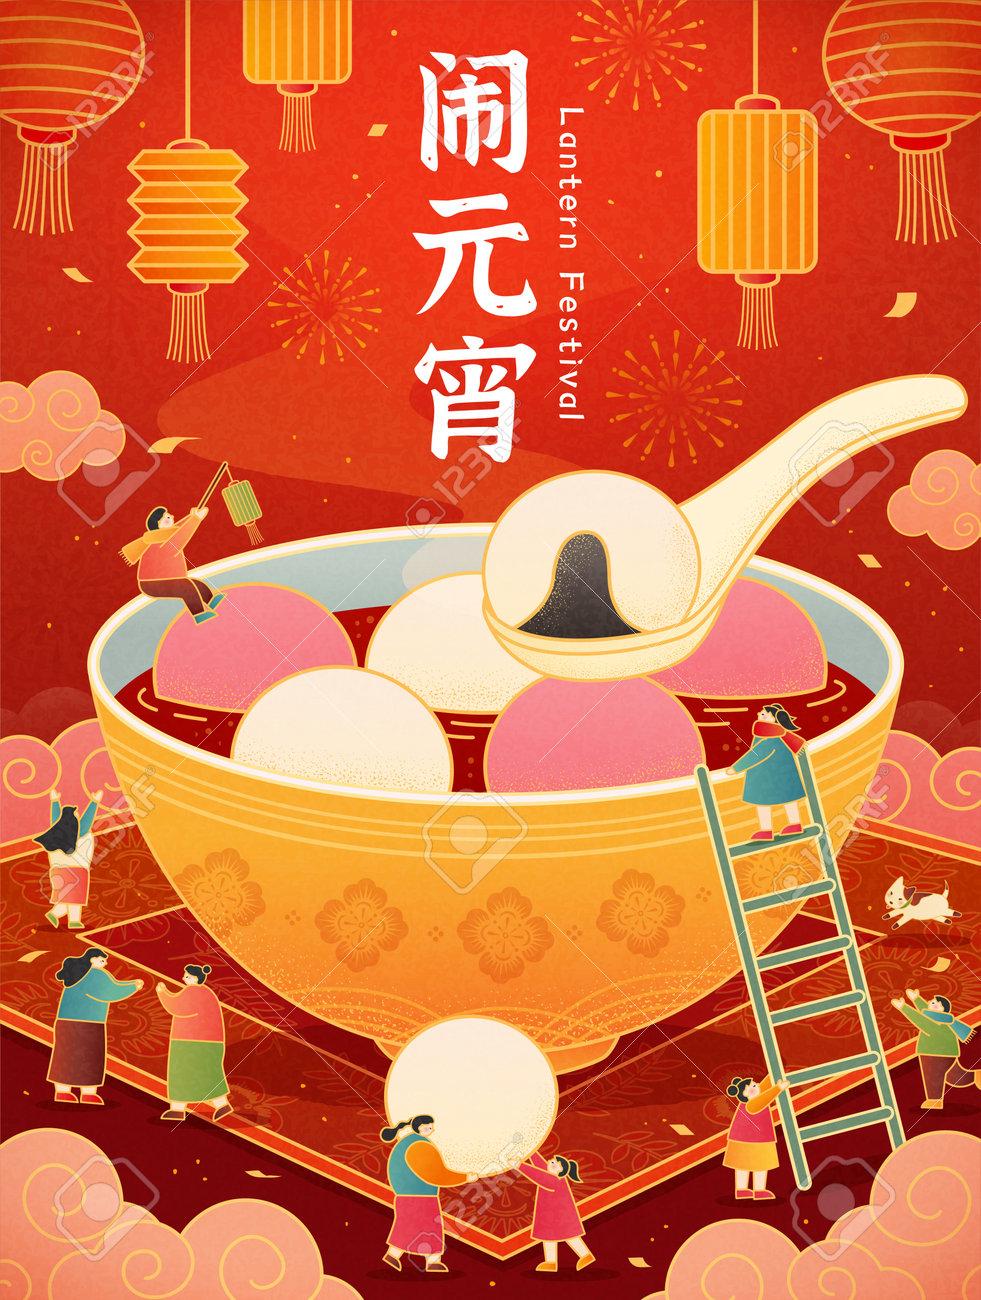 Miniature Asian people enjoying a huge bowl of tasty glutinous rice balls and beautiful lantern scenery. Translation: Happy lantern festival - 162633973